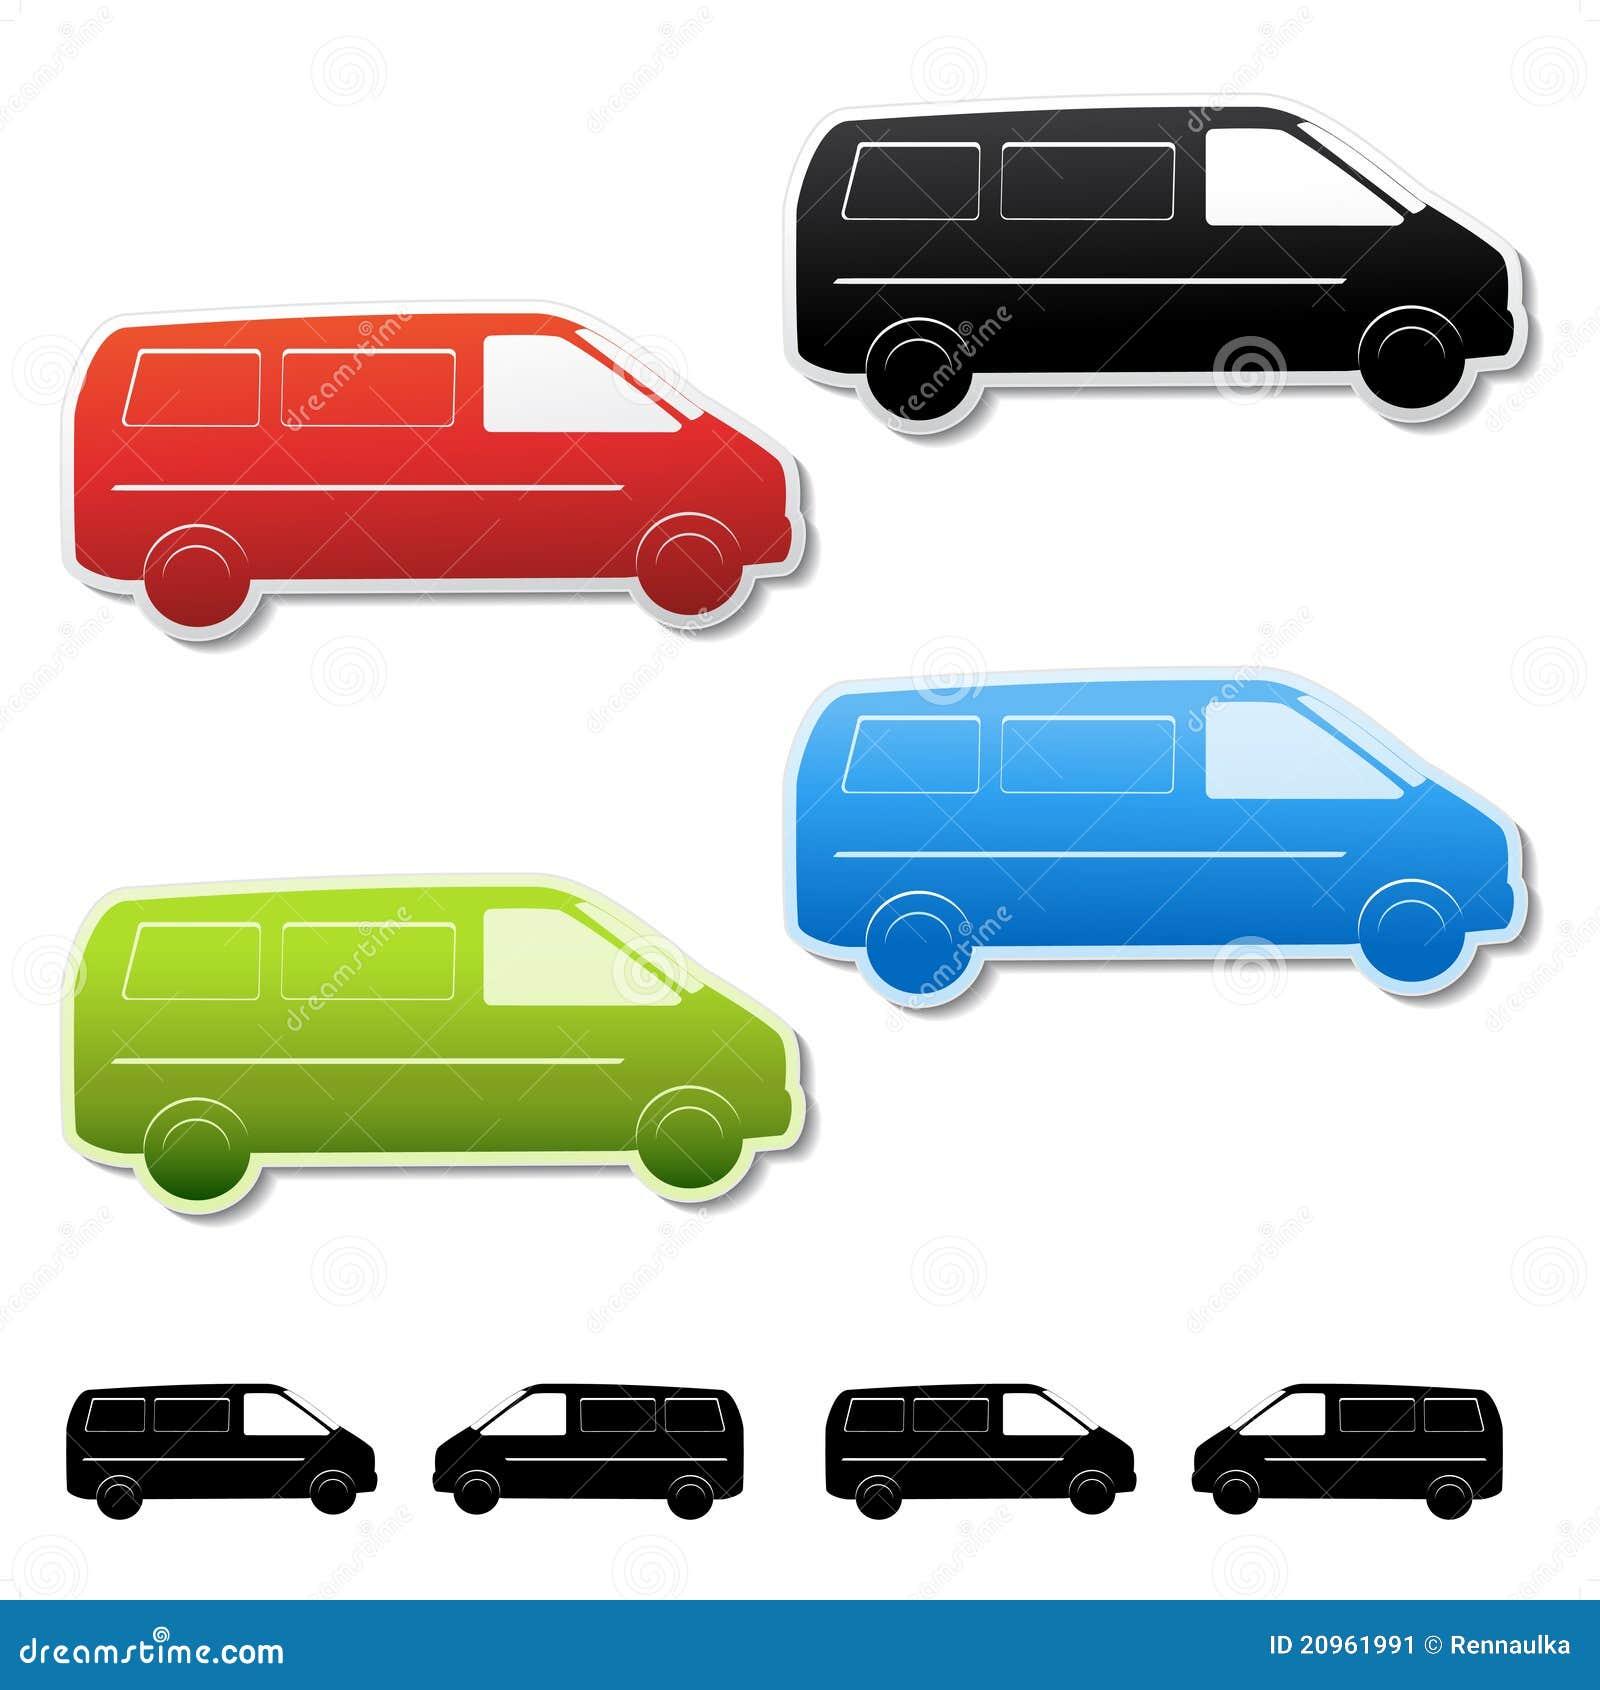 Car sticker design vector free - Vector Car Stickers Gratis Or Free Delivery